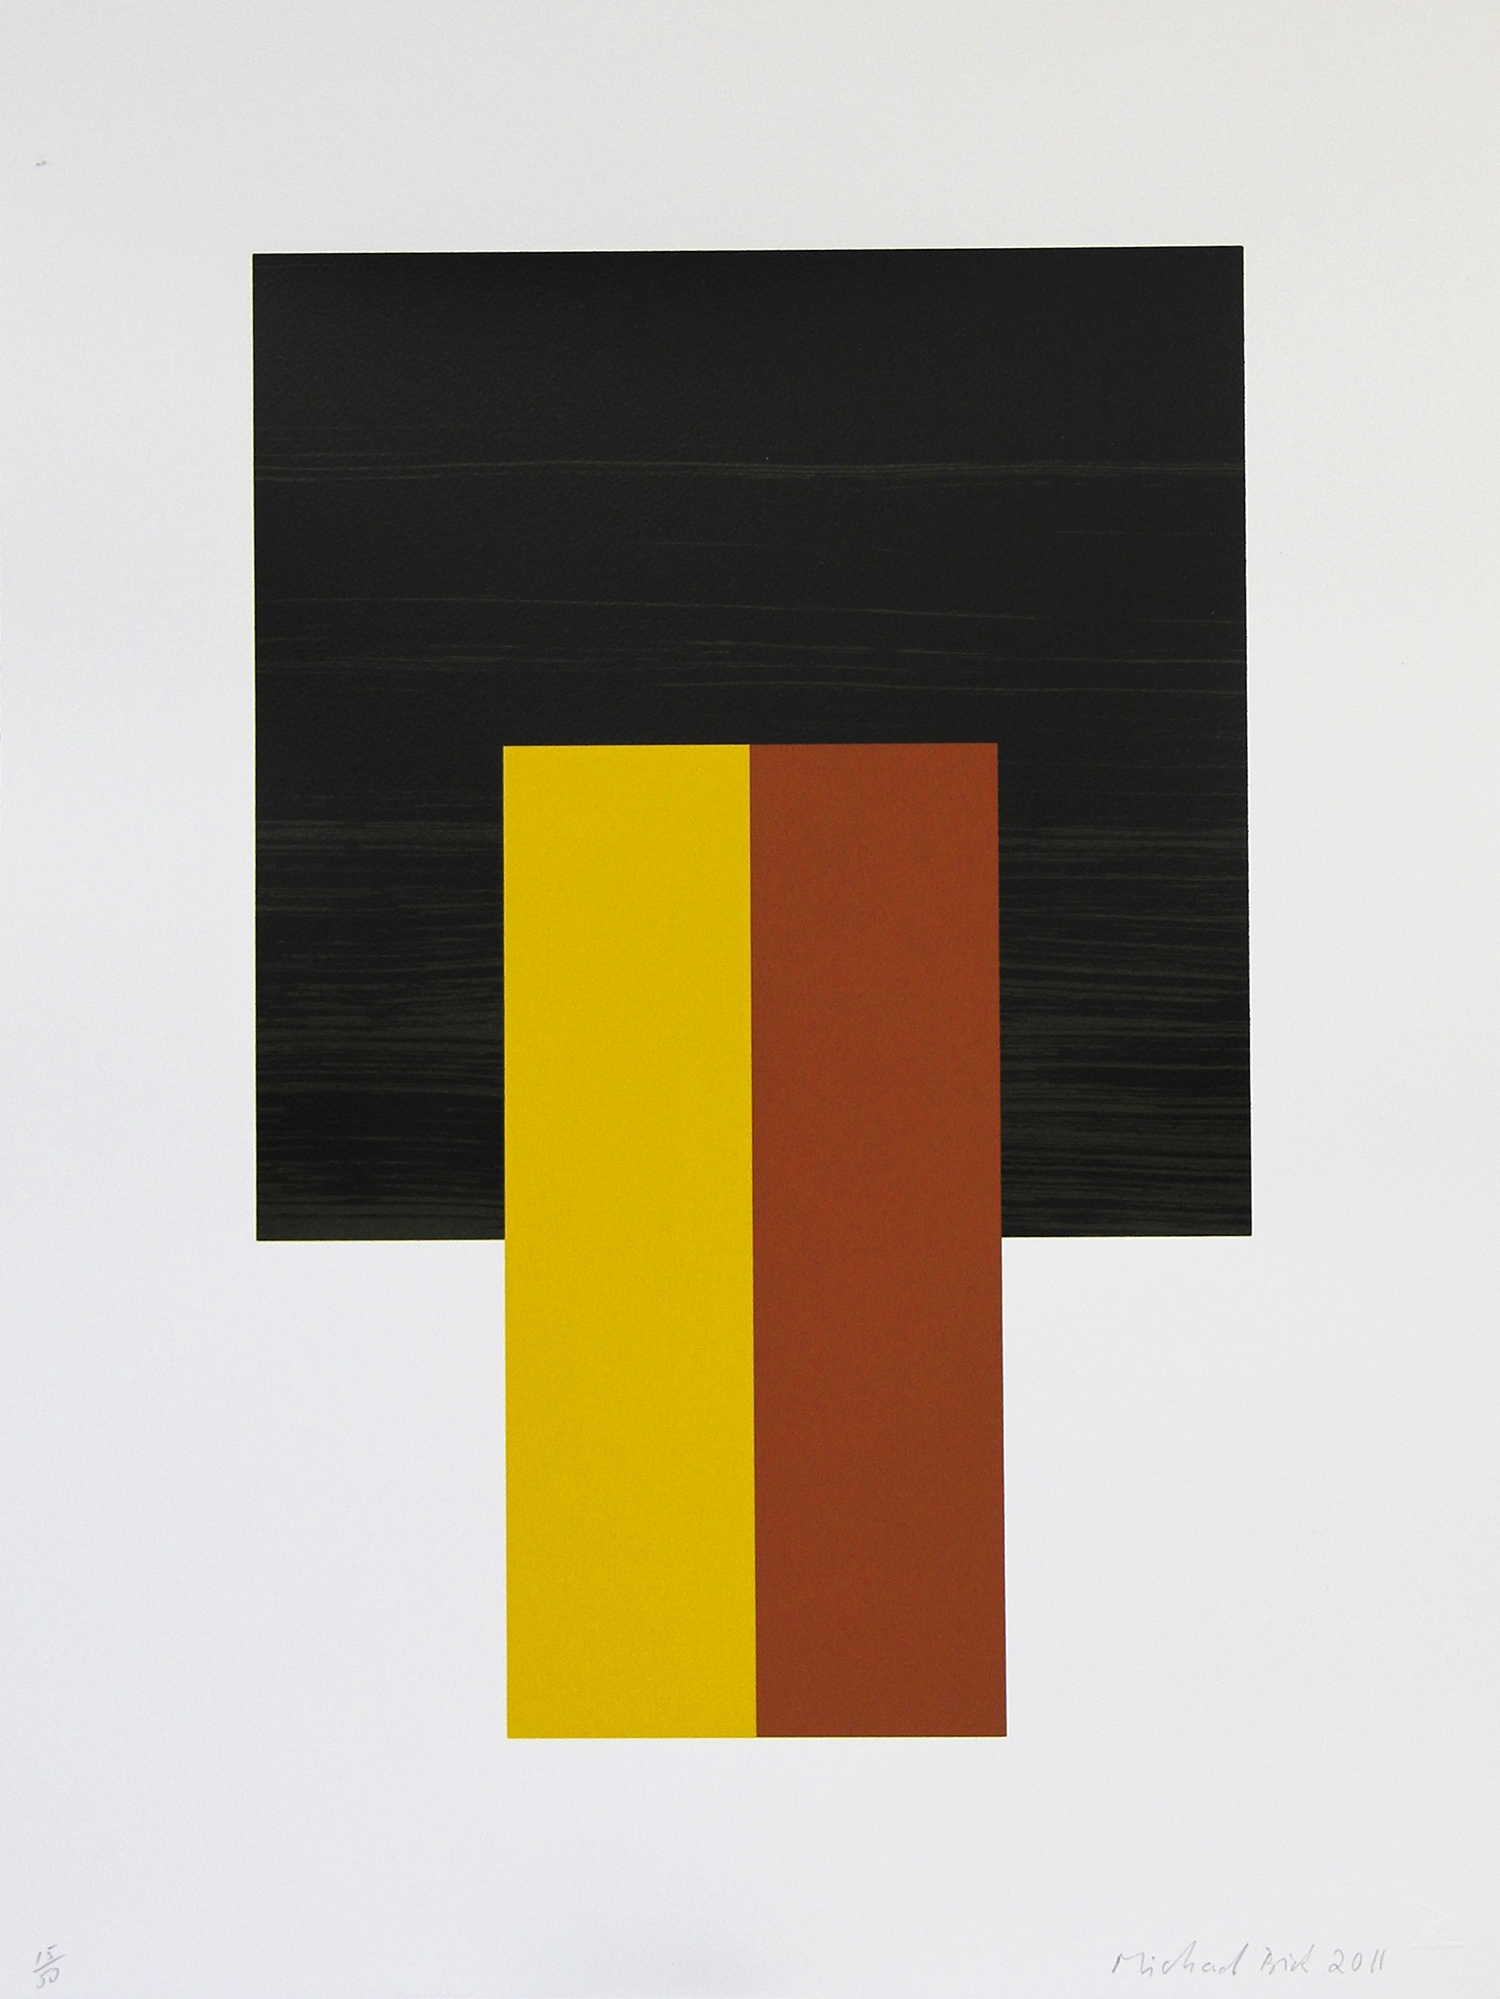 Michael Brick, Double Earth    Date:  2012   Size (cm - unframed):  65 x 49   Technique:  Screenprint   Materials:  Somerset Velvet 300gsm   Edition size:  50   Publisher:  The Print Studio   Copyright:  The Artist     P.O.A.